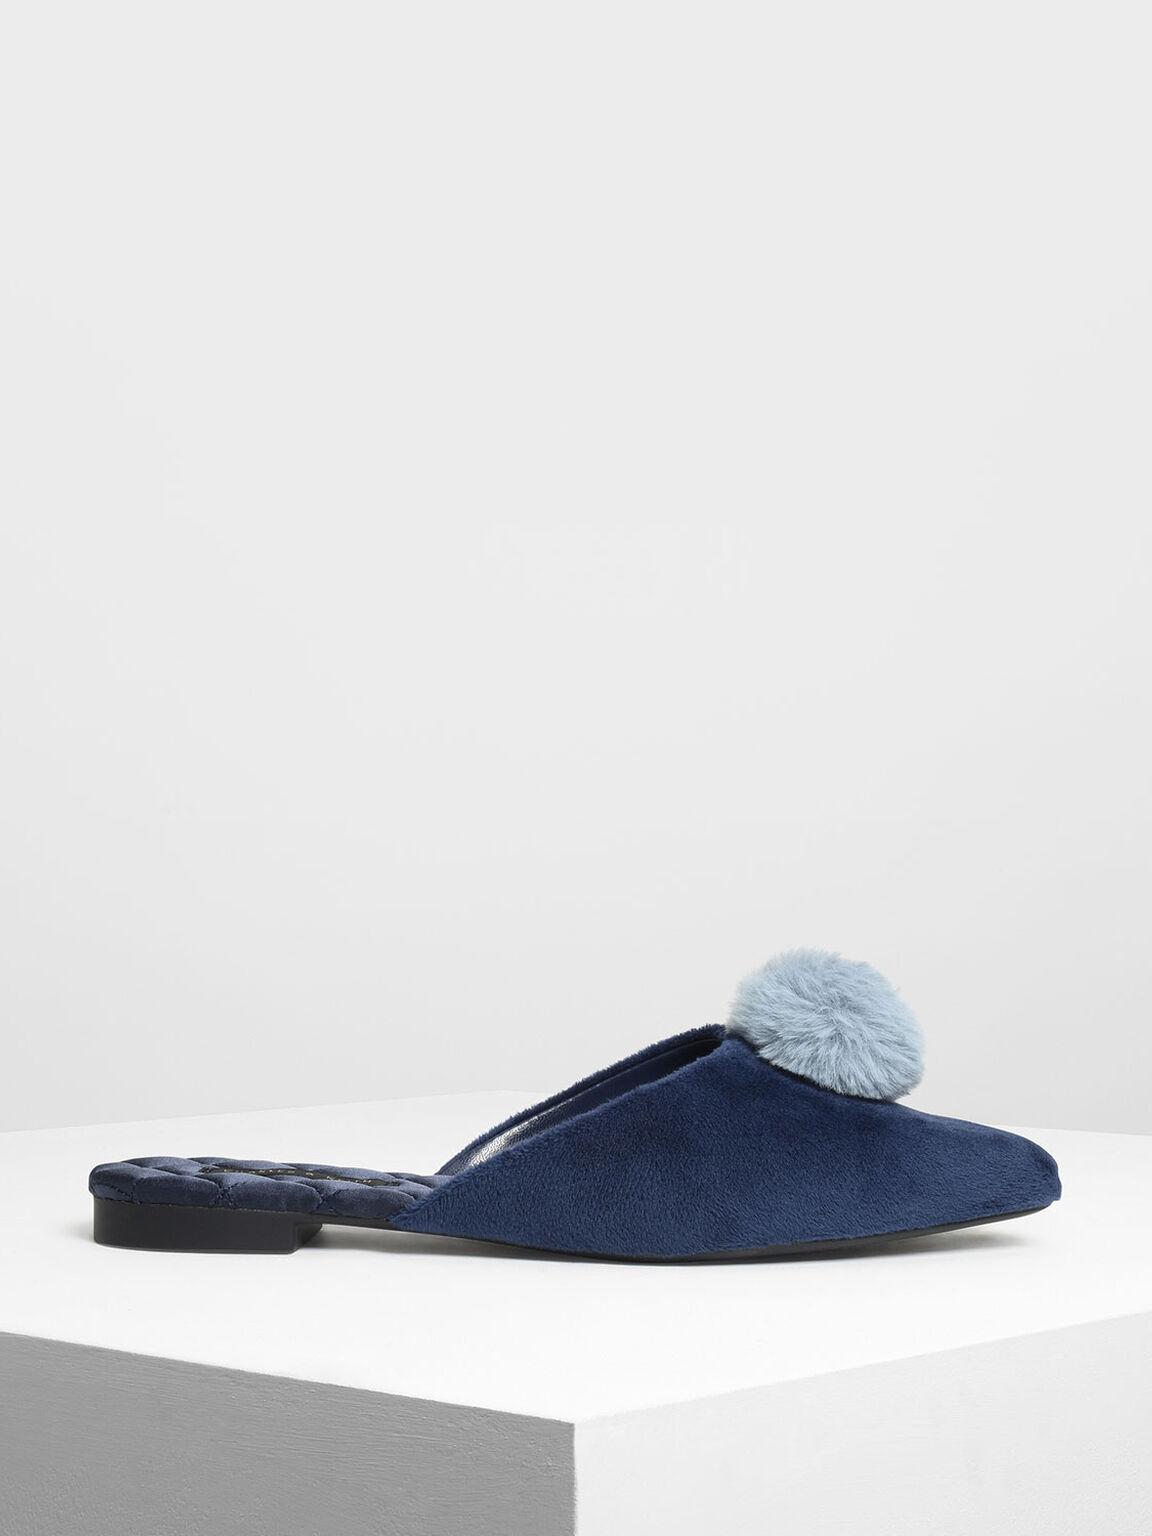 Furry Pointed Pom Pom Slip Ons, Dark Blue, hi-res